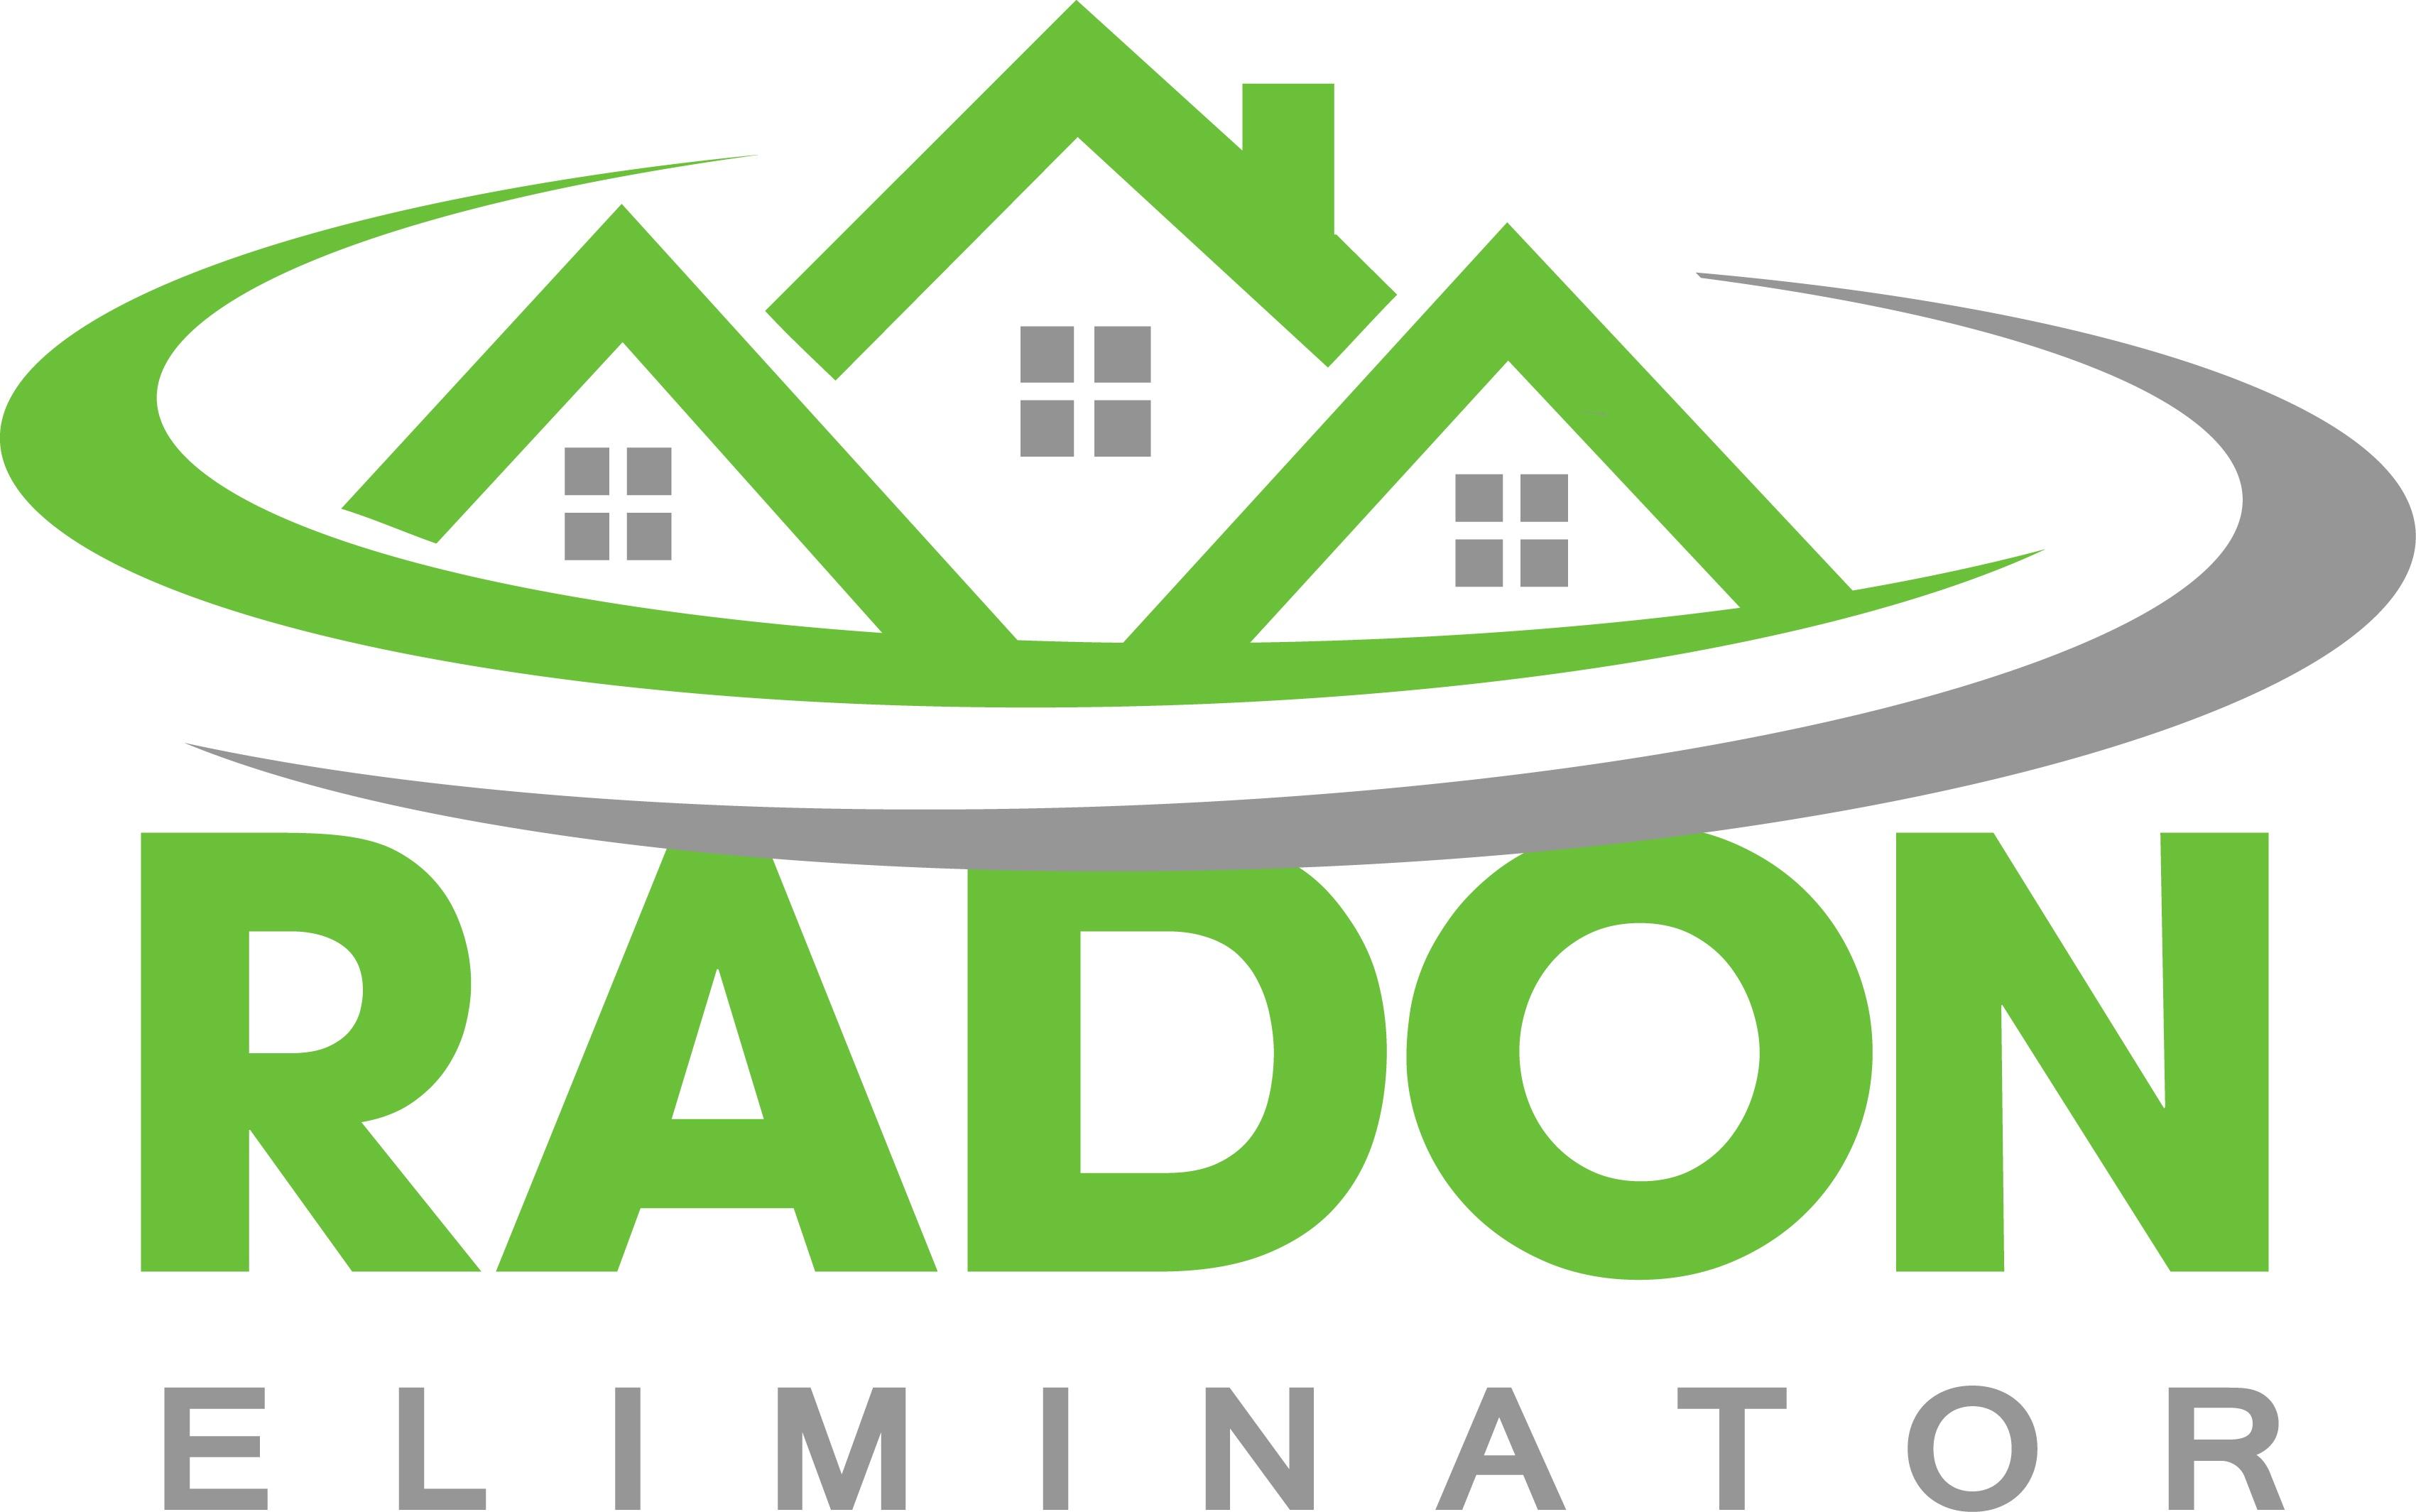 Radon Eliminator Mitigation and Testing.